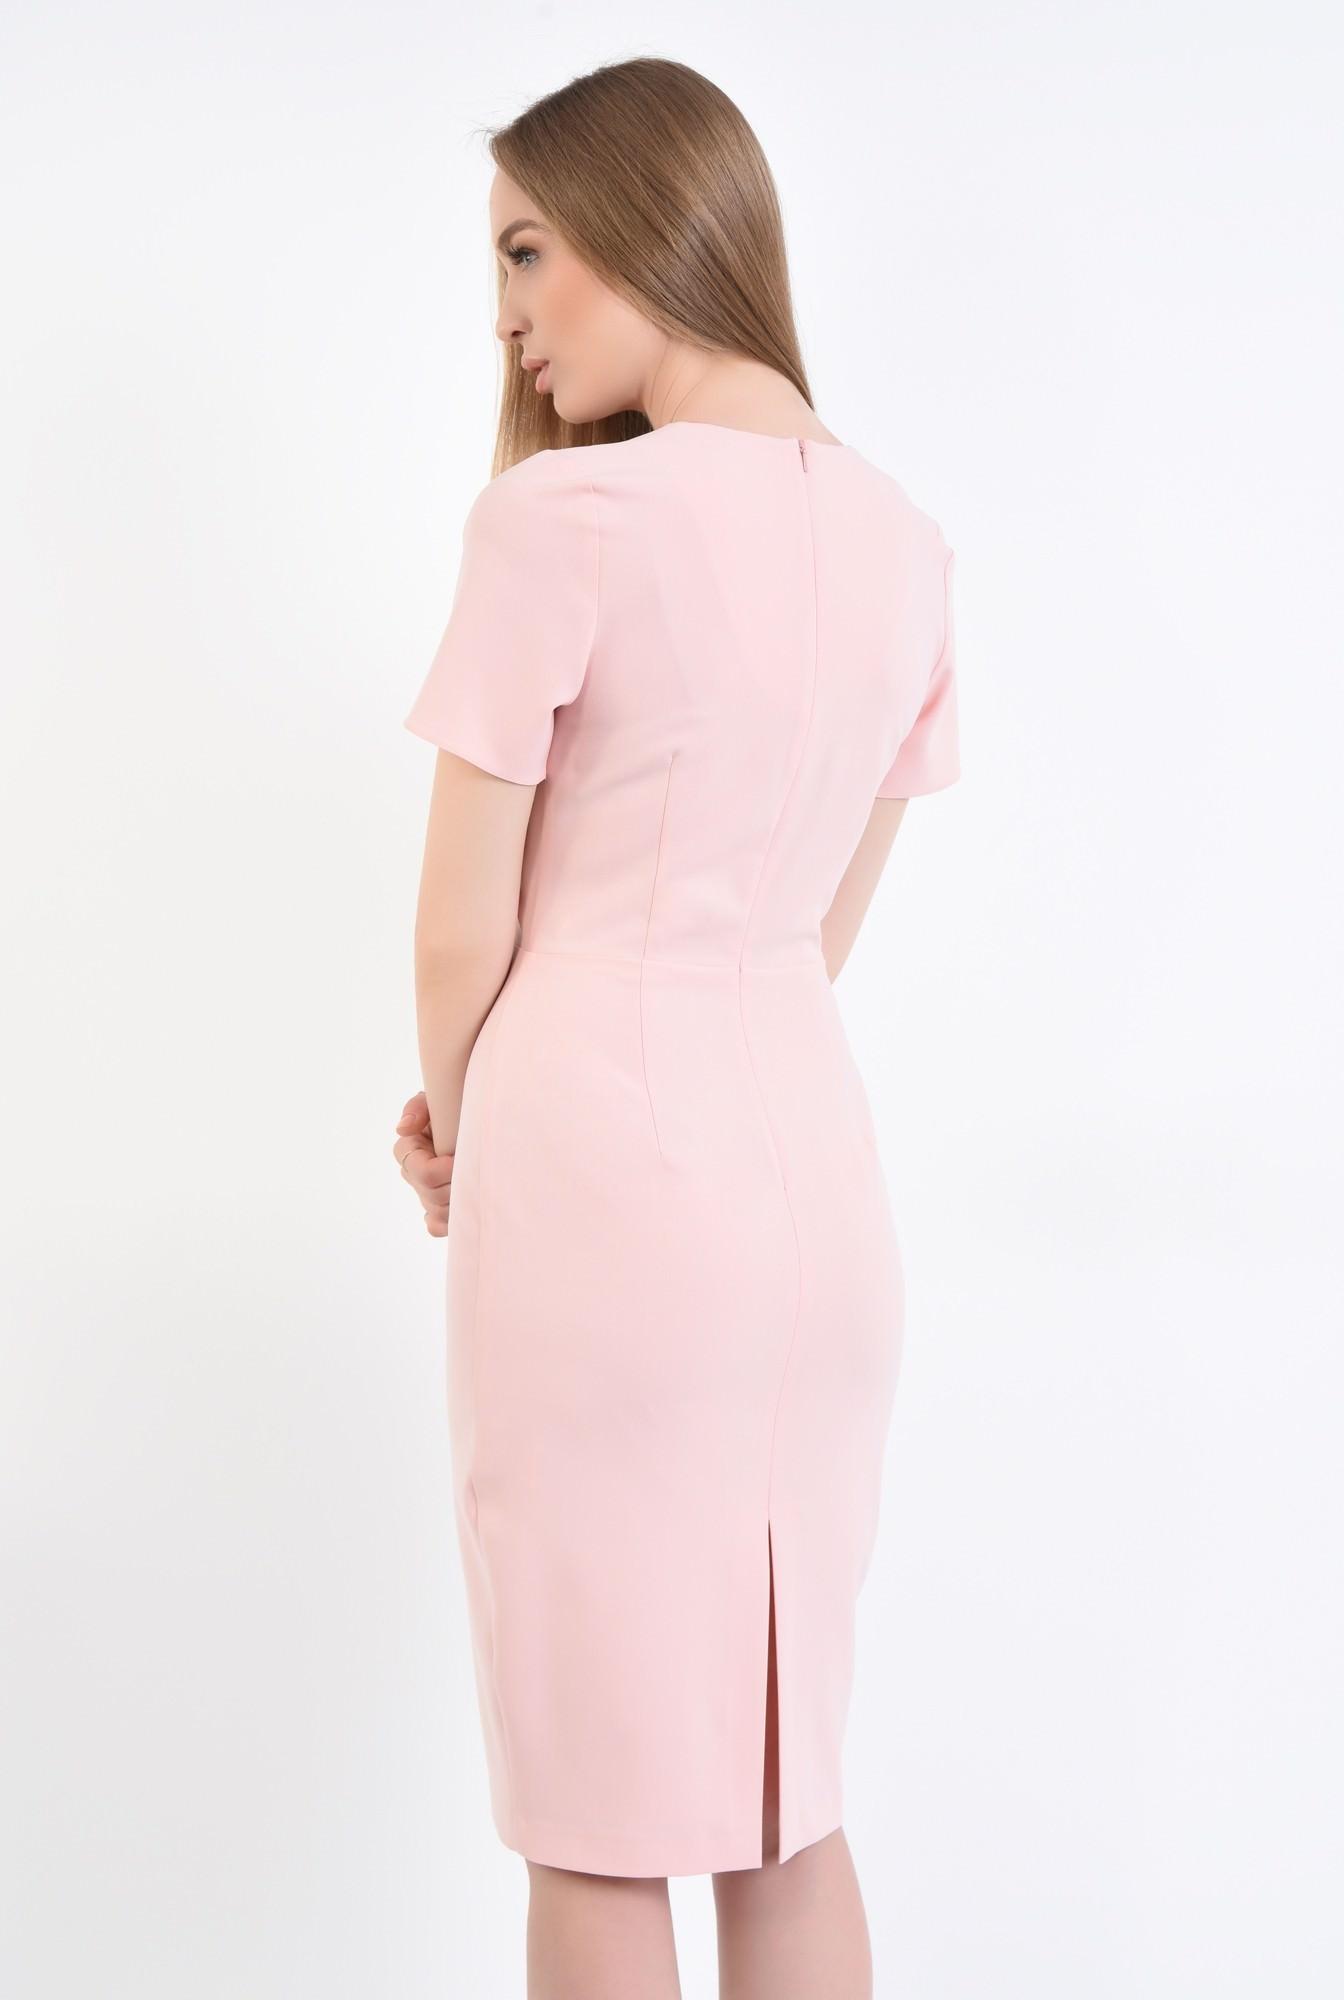 1 - Rochie conica, roz